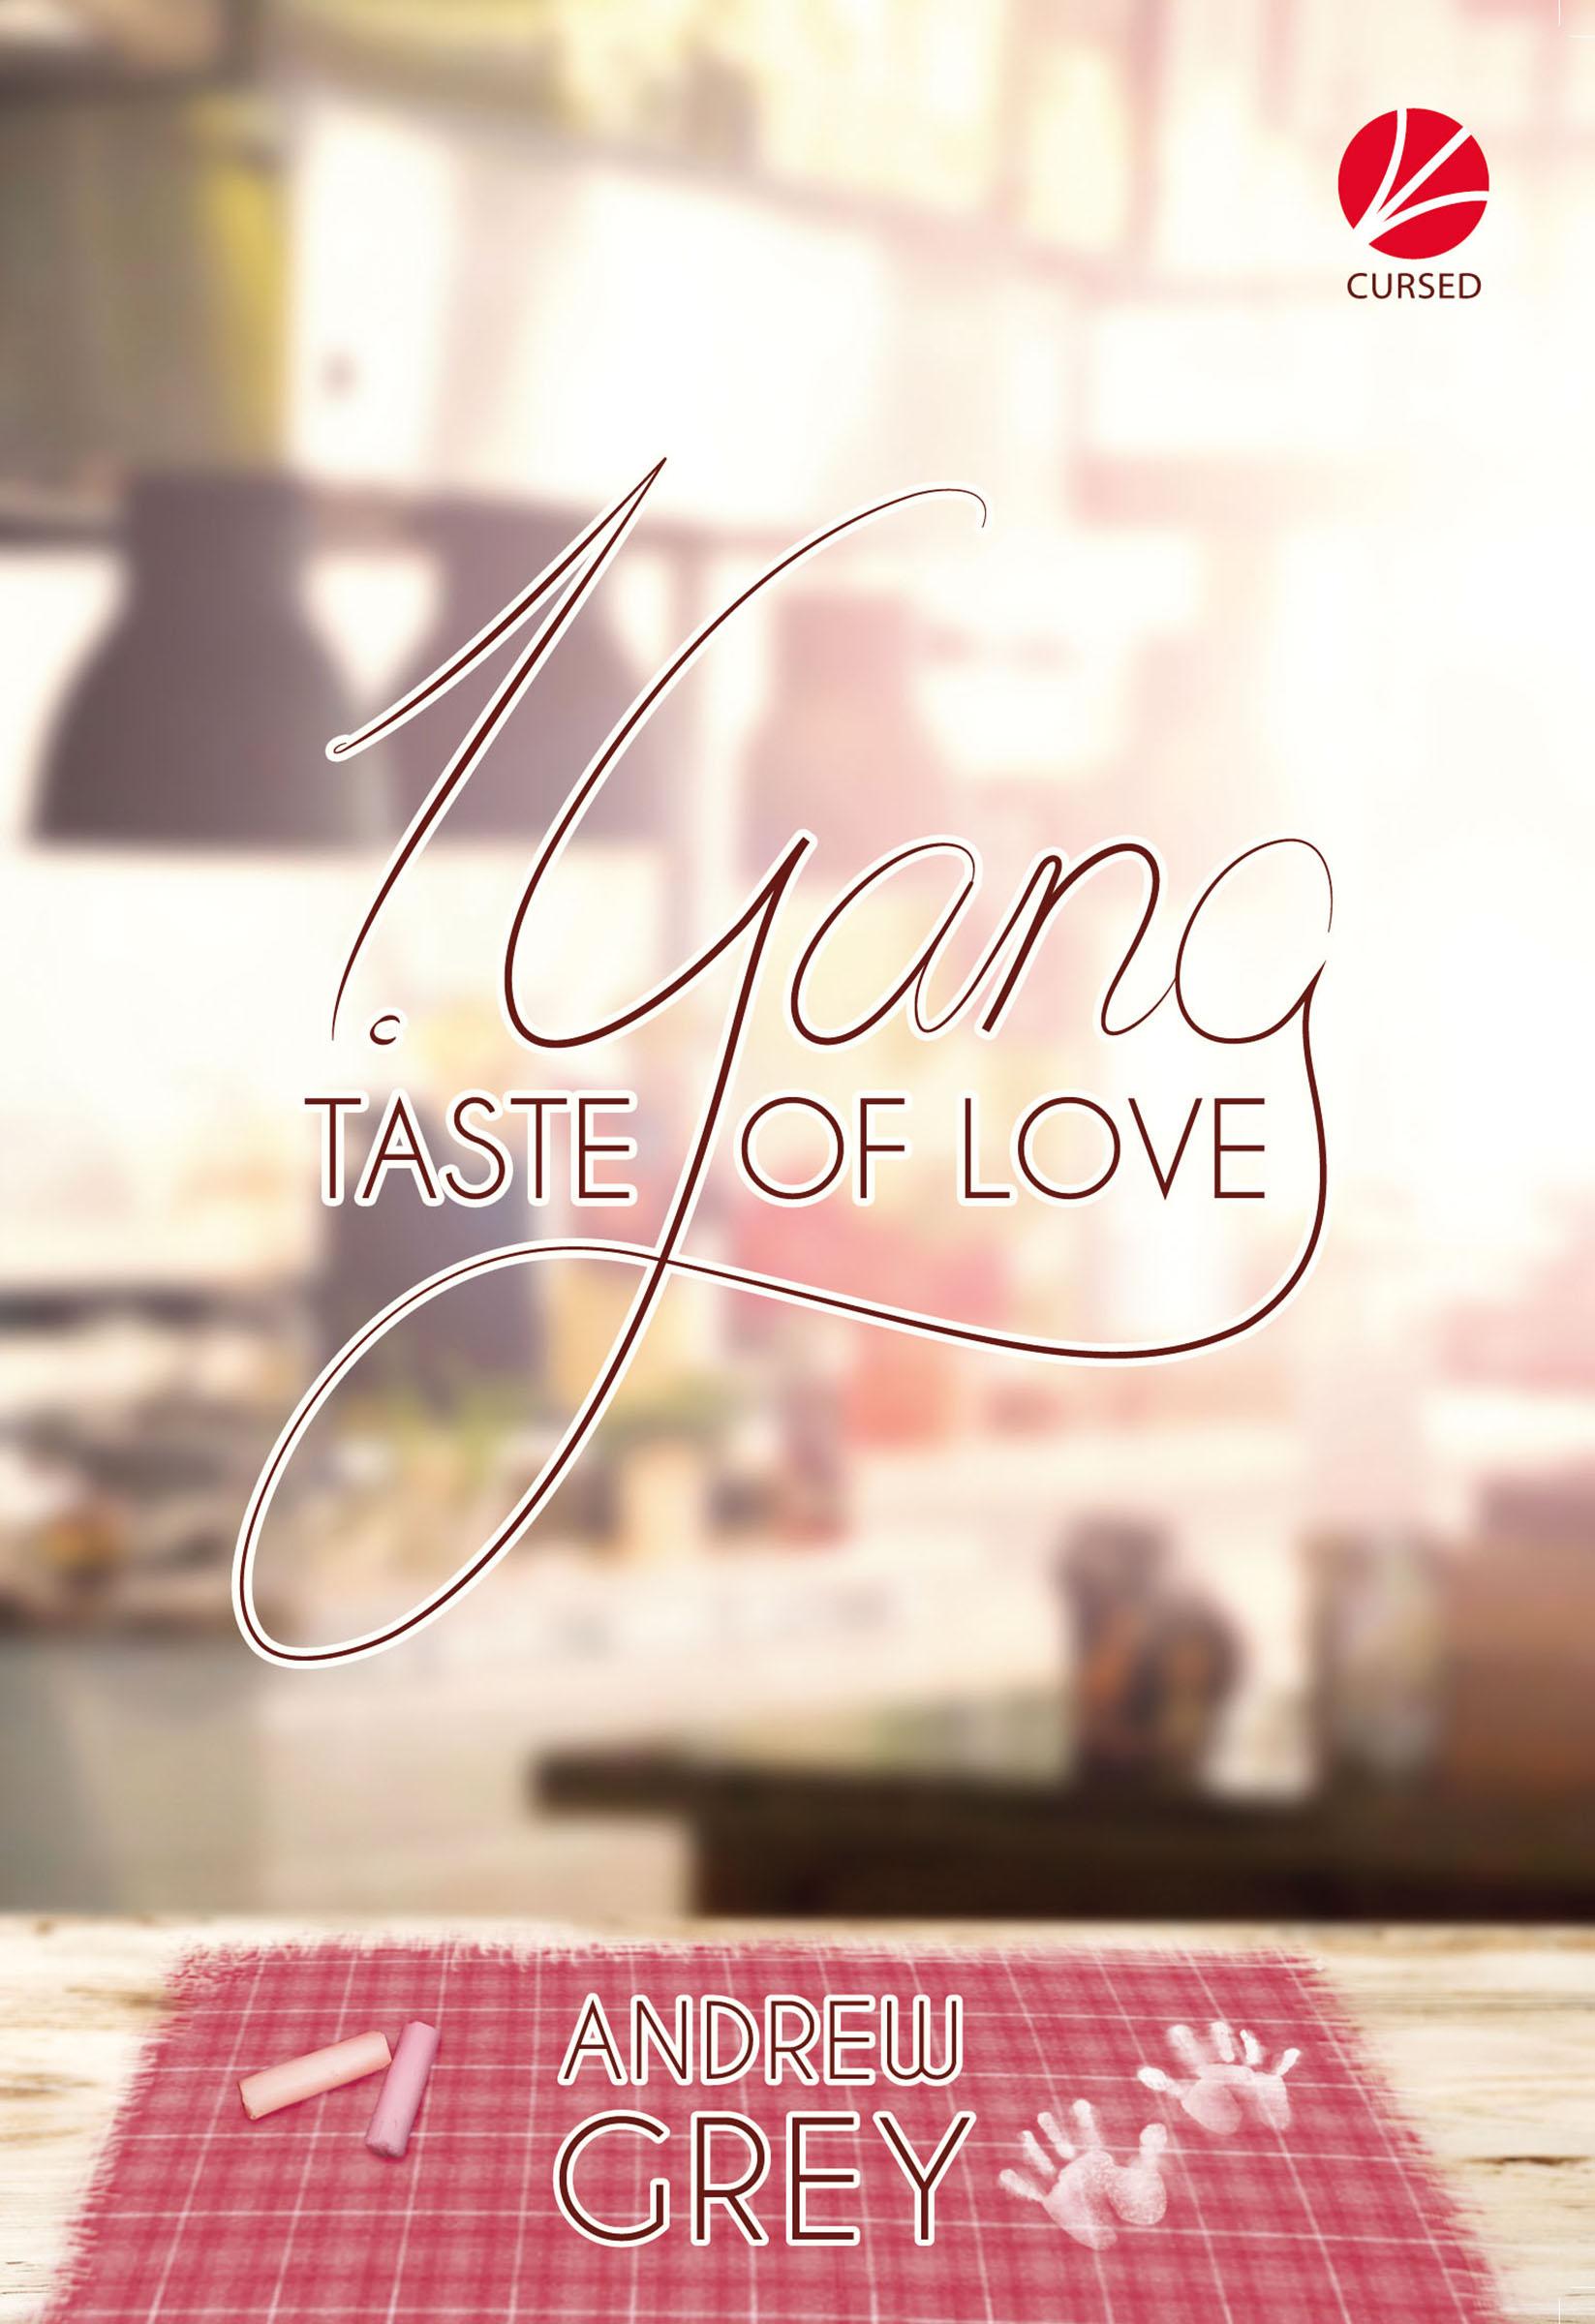 Andrew Grey Taste of Love: 1. Gang royal taste of